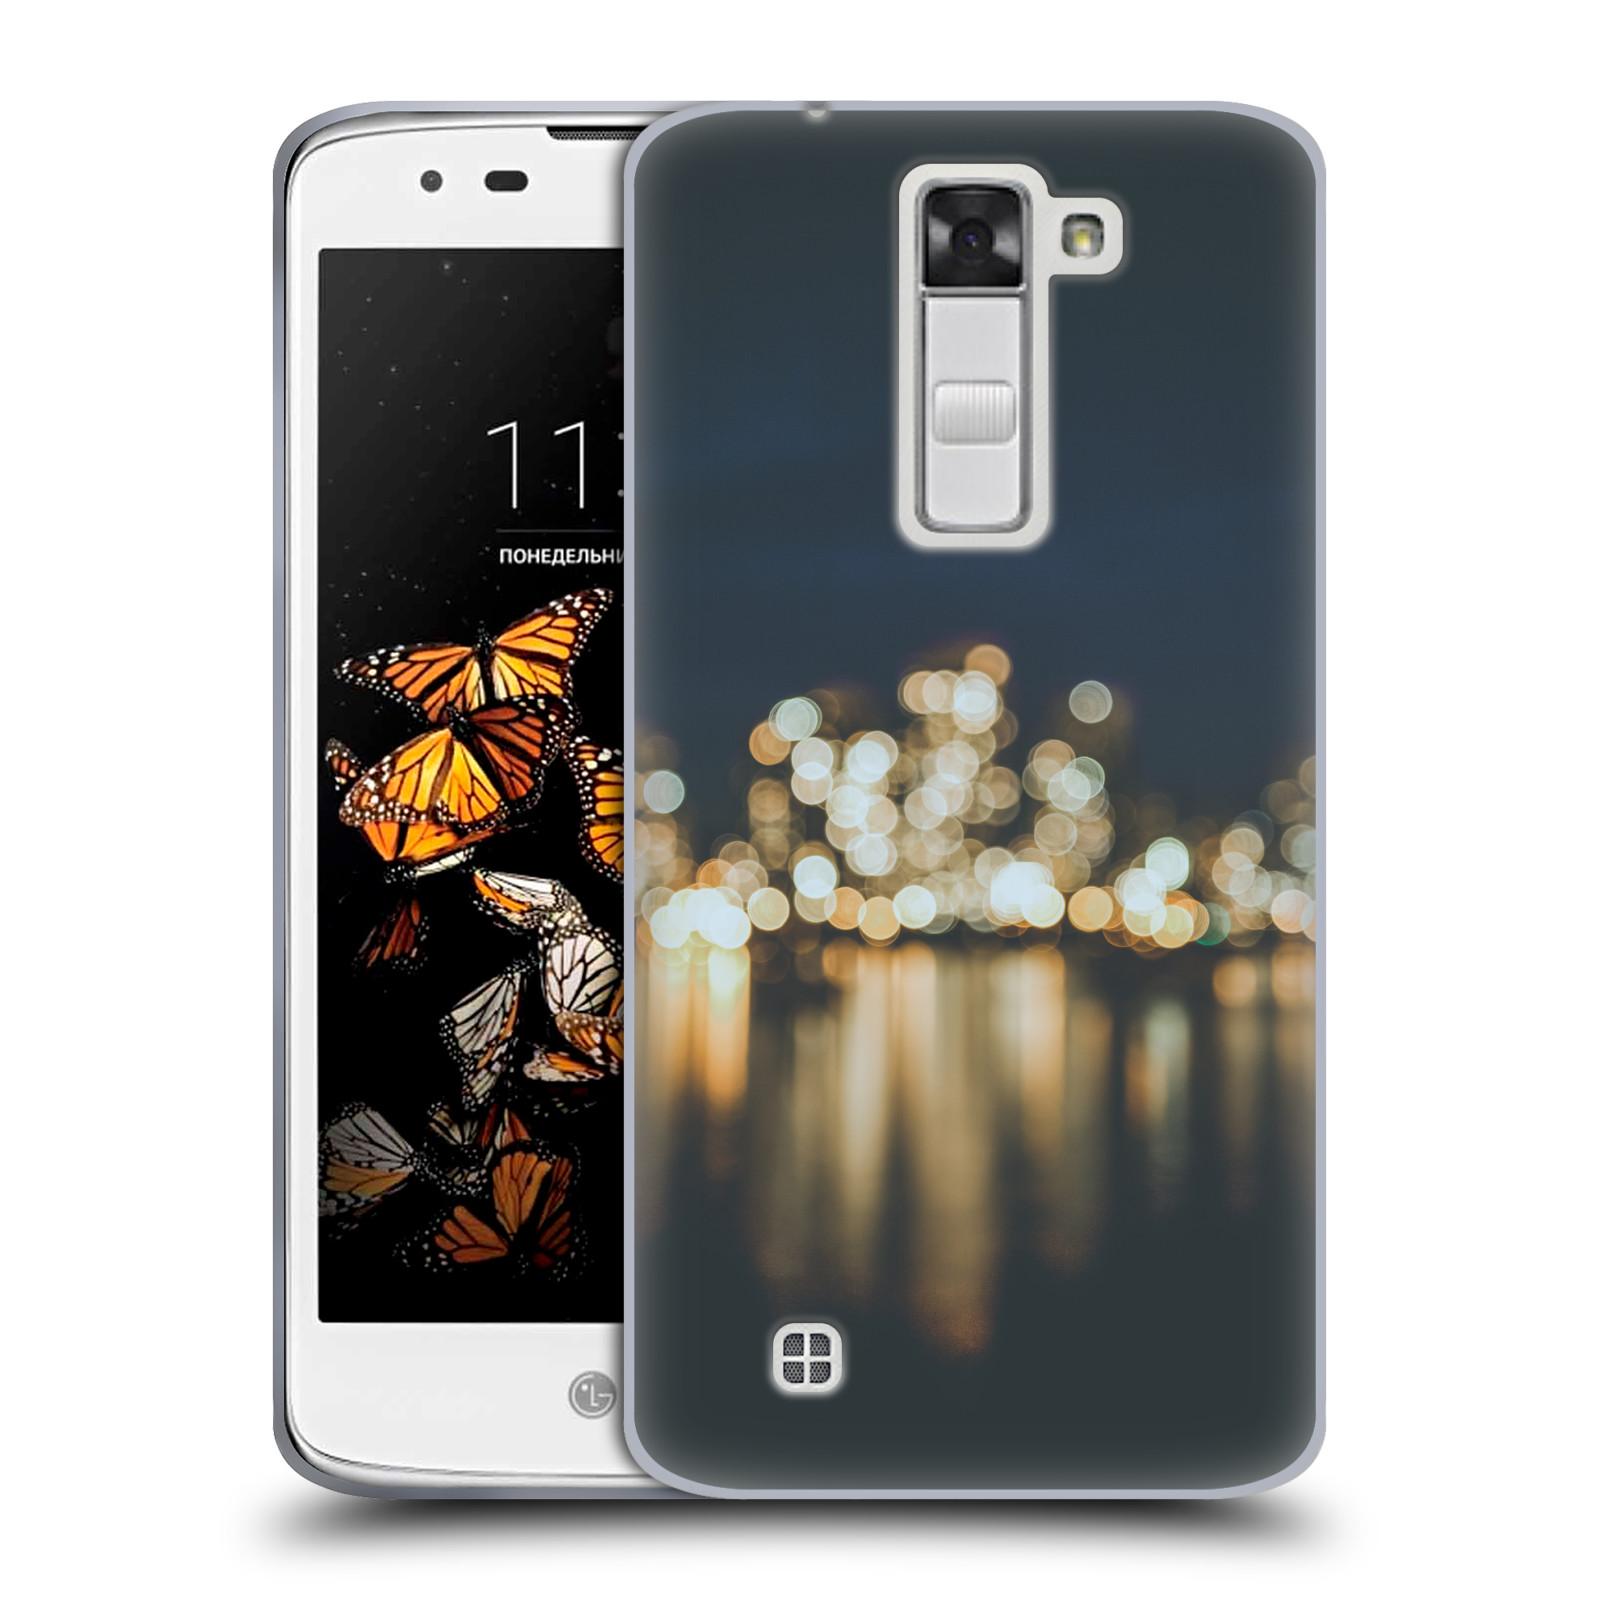 OFFICIAL-LUKE-GRAM-SKYSCAPES-SOFT-GEL-CASE-FOR-LG-PHONES-2